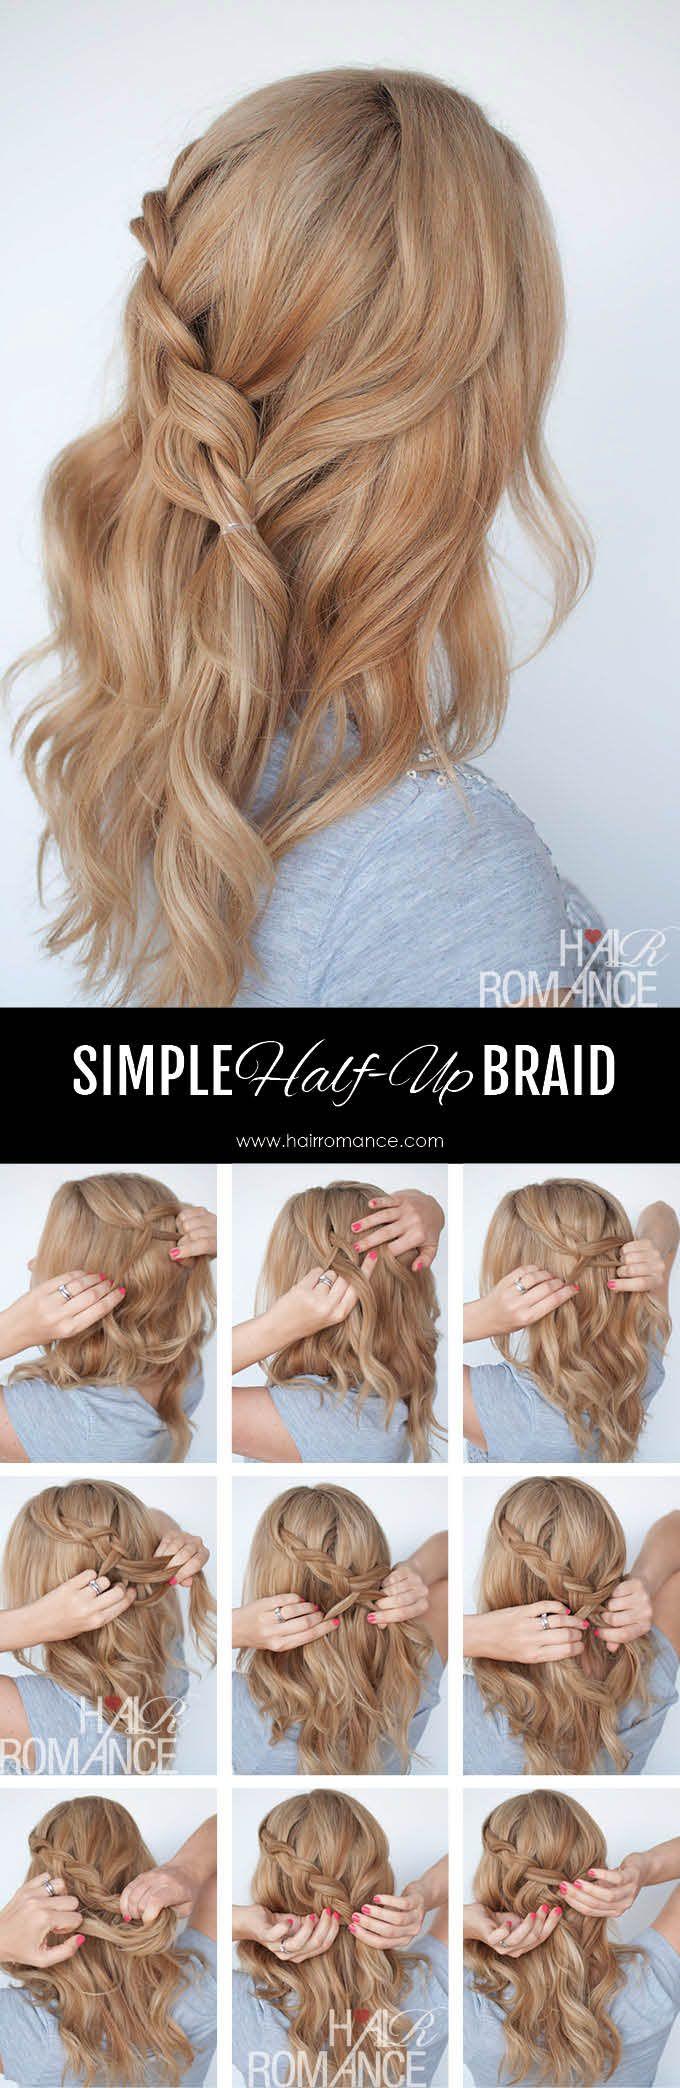 Try this simple halfup braid tutorial for me braids